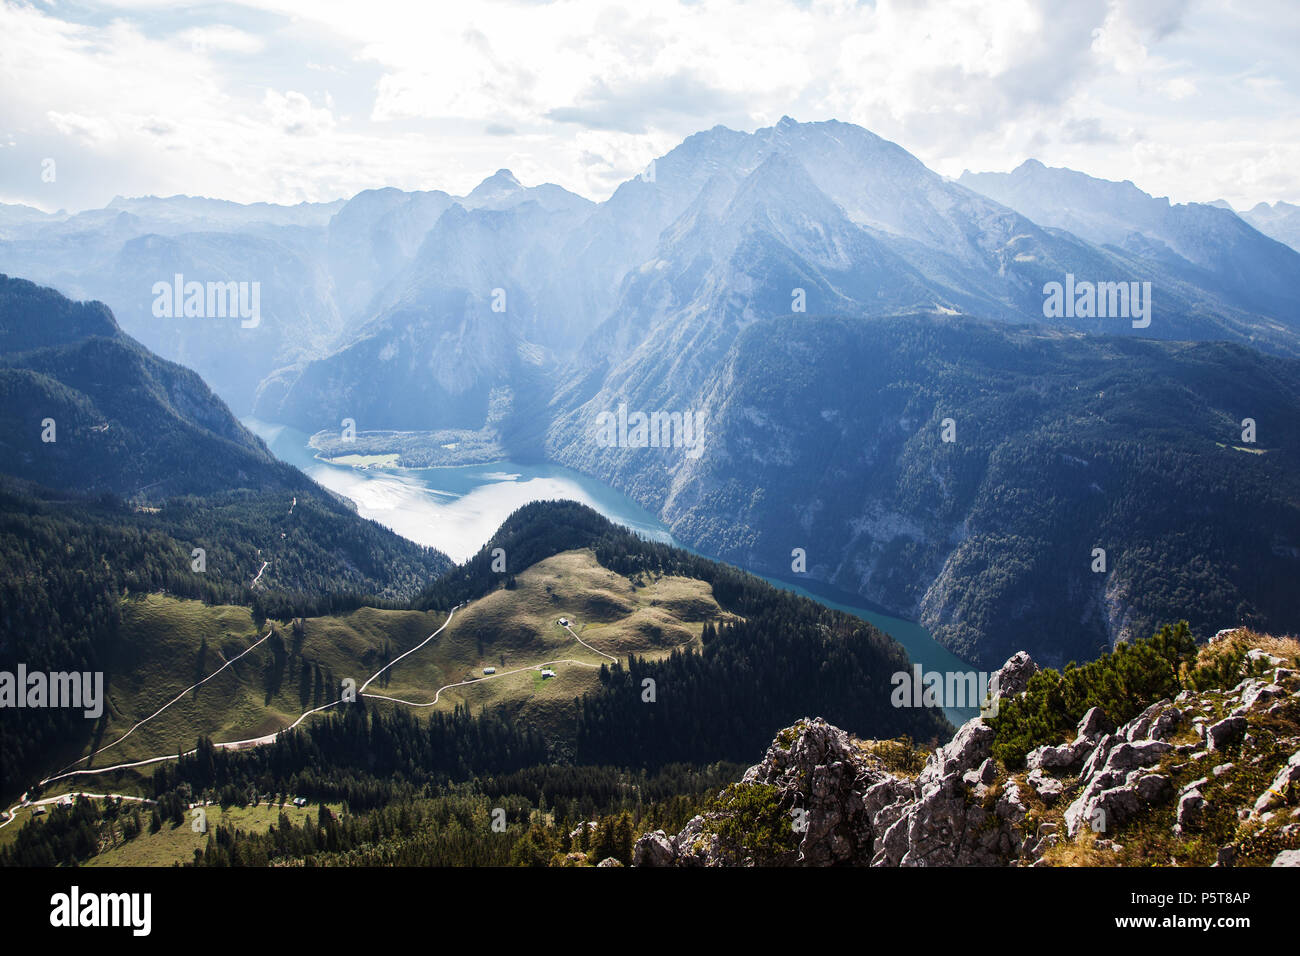 Klettersteig Jenner : Klettersteig am jenner mit gipfelkreuz im berchtesgadener land